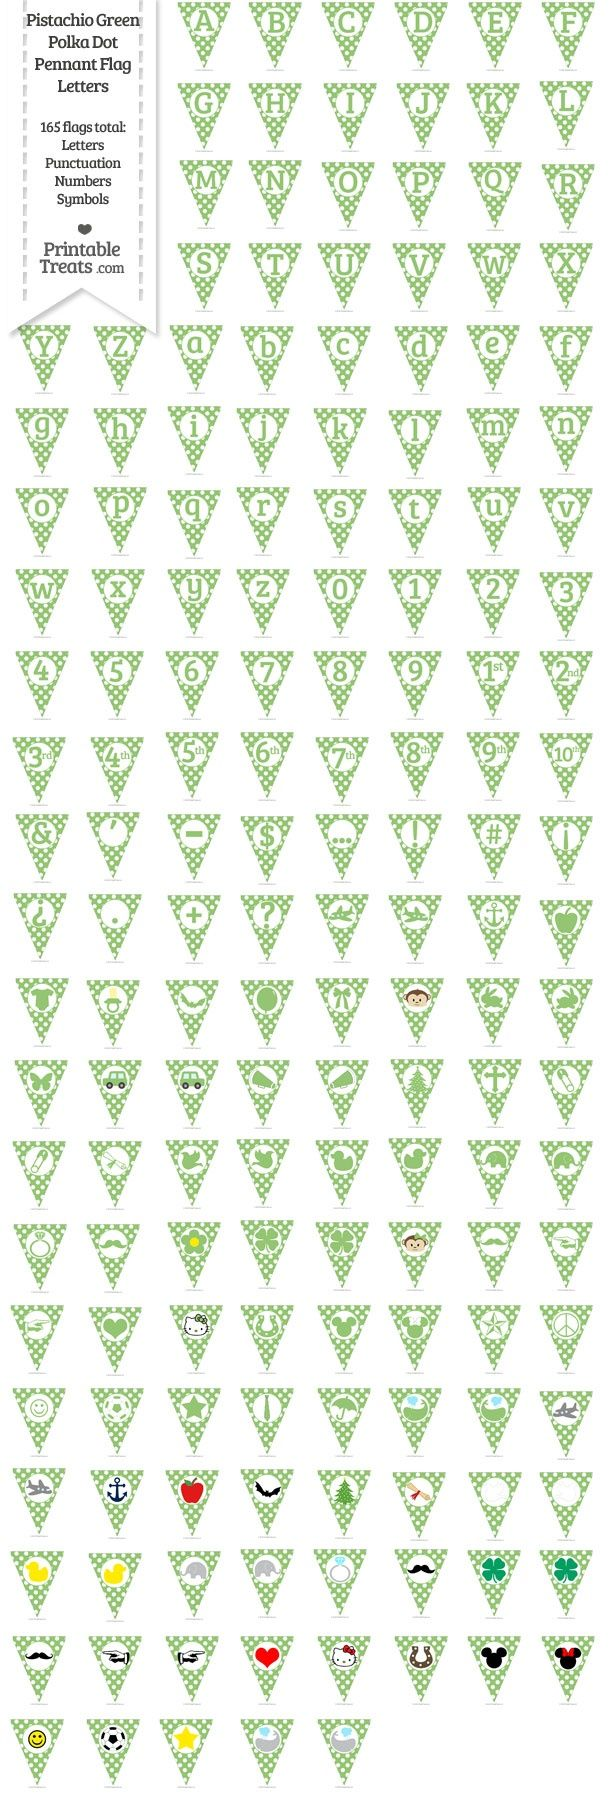 165 Pistachio Green Polka Dot Pennant Flag Letters Password